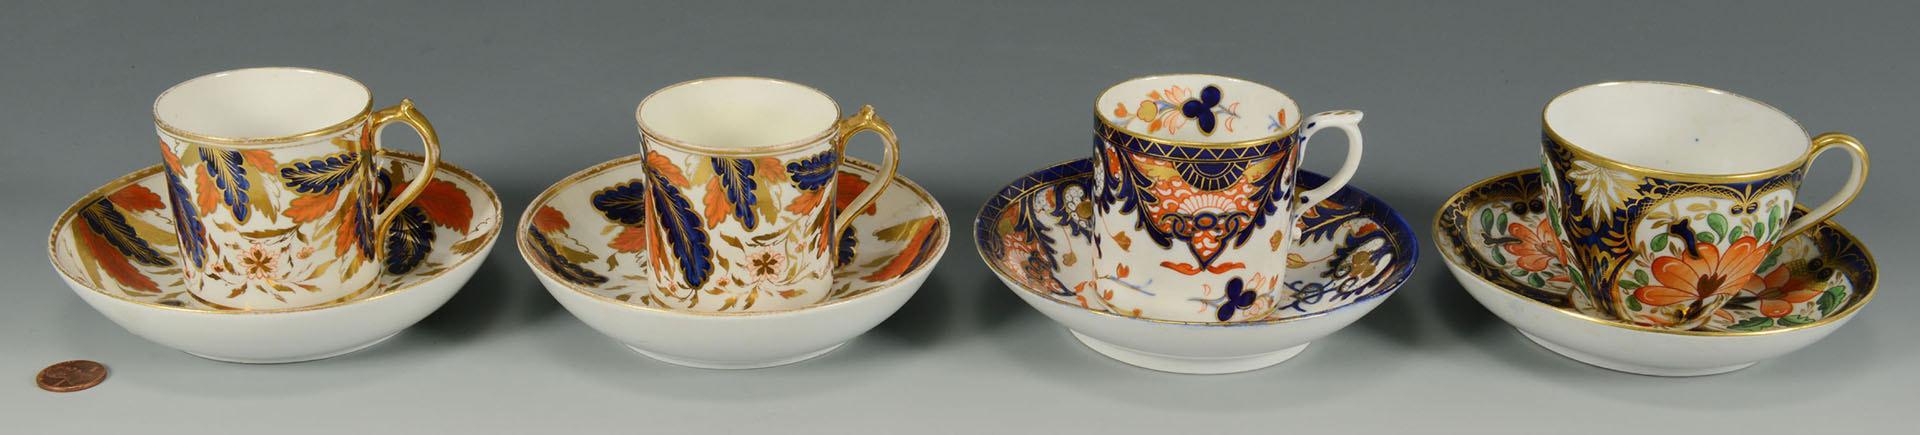 Lot 570: 4 English Imari cups and saucers inc Miles Mason